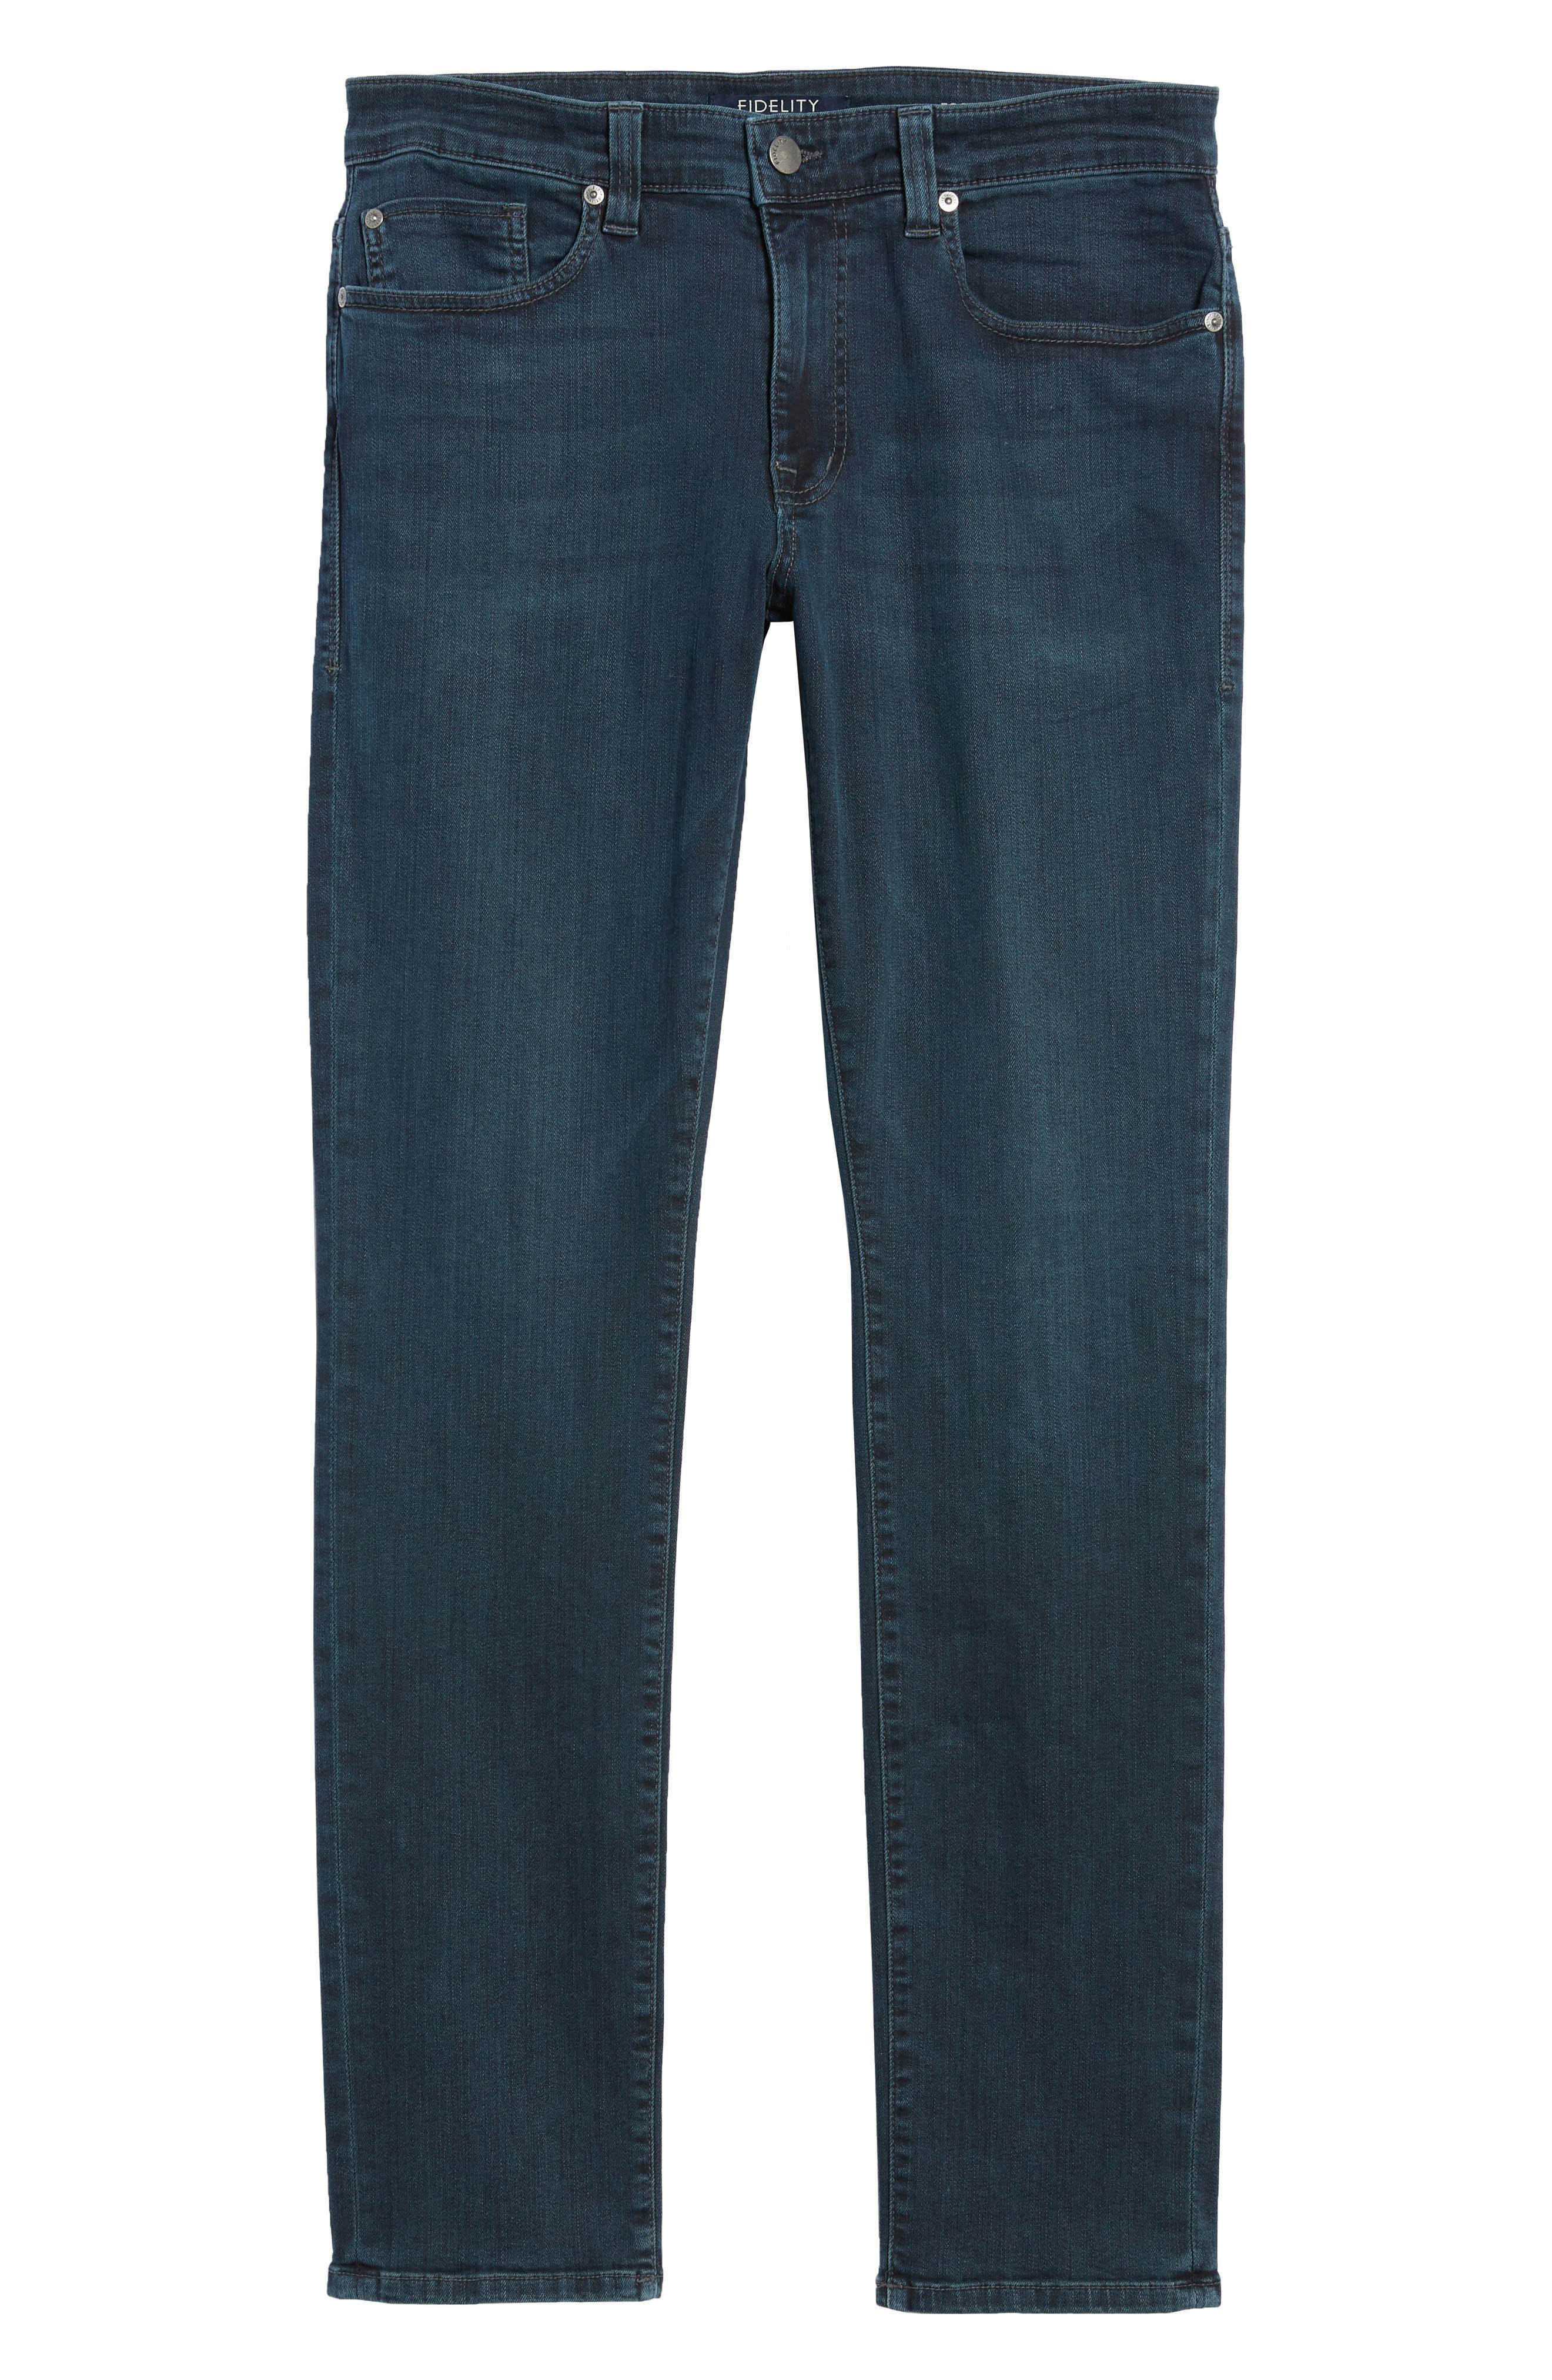 Torino Slim Fit Jeans,                             Alternate thumbnail 6, color,                             Manchester